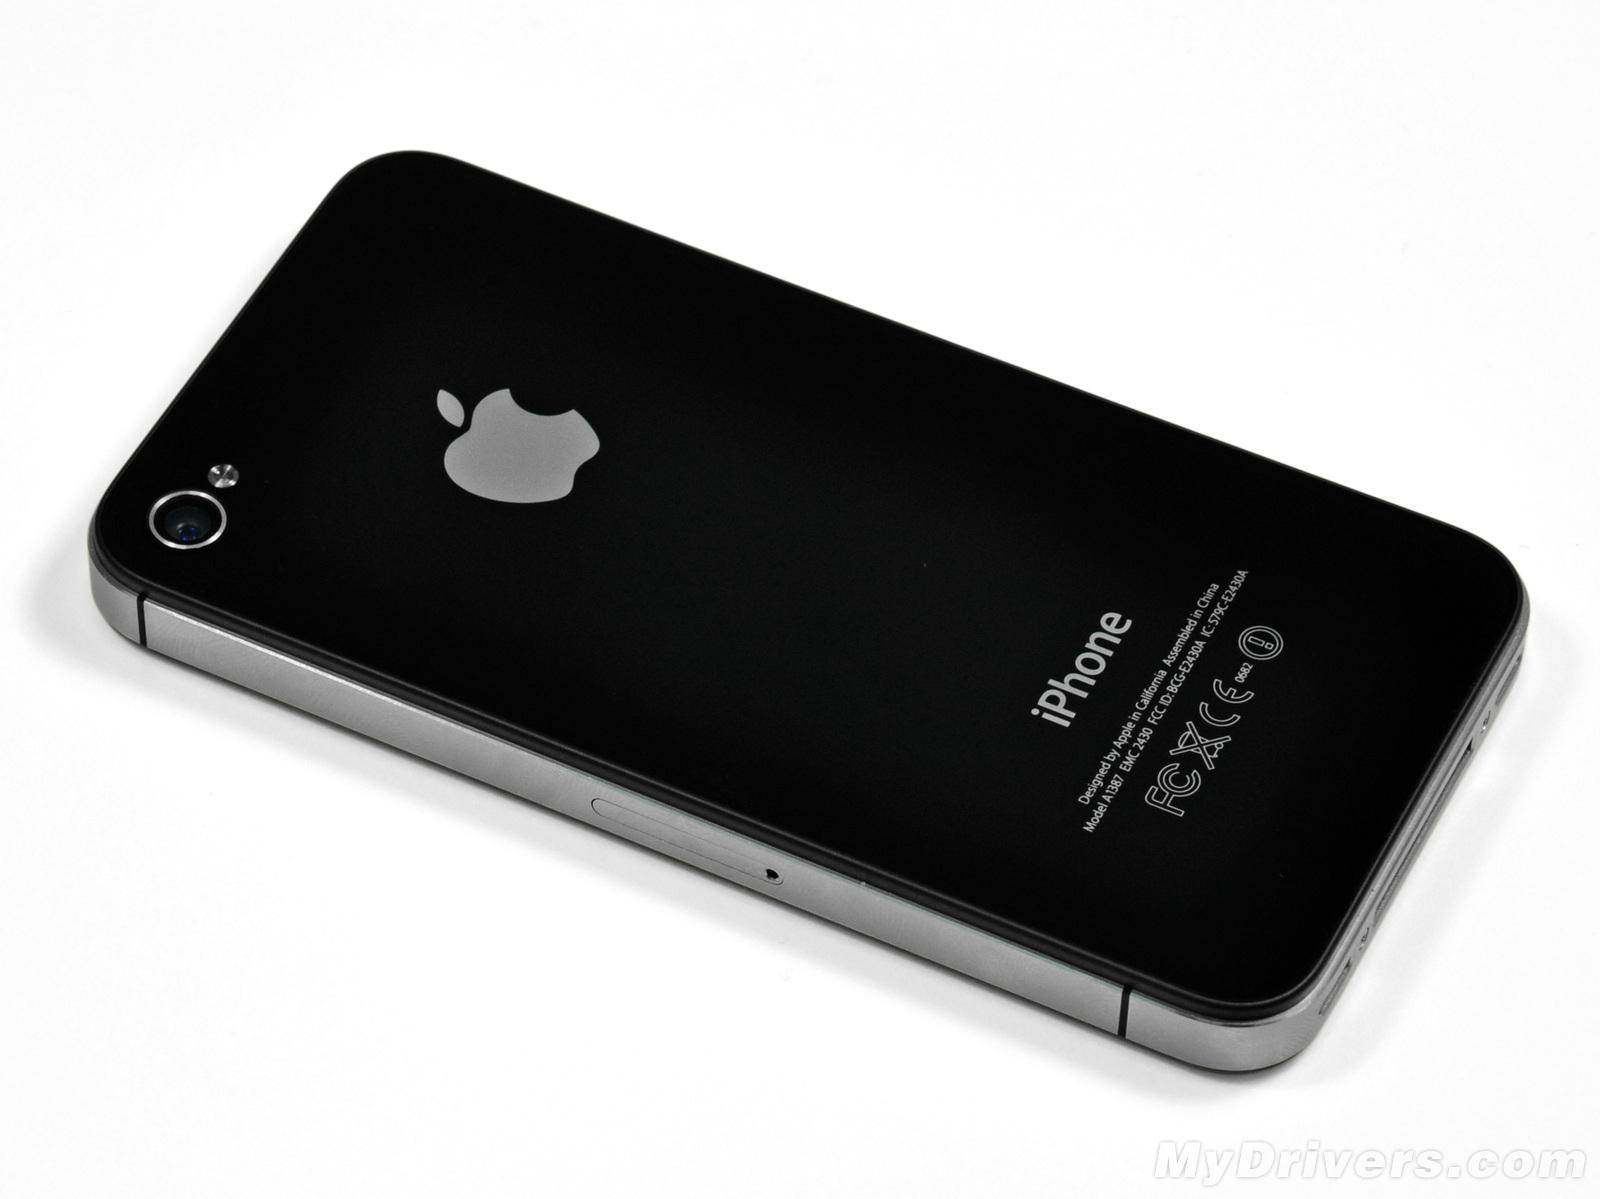 iphone 4s拆解